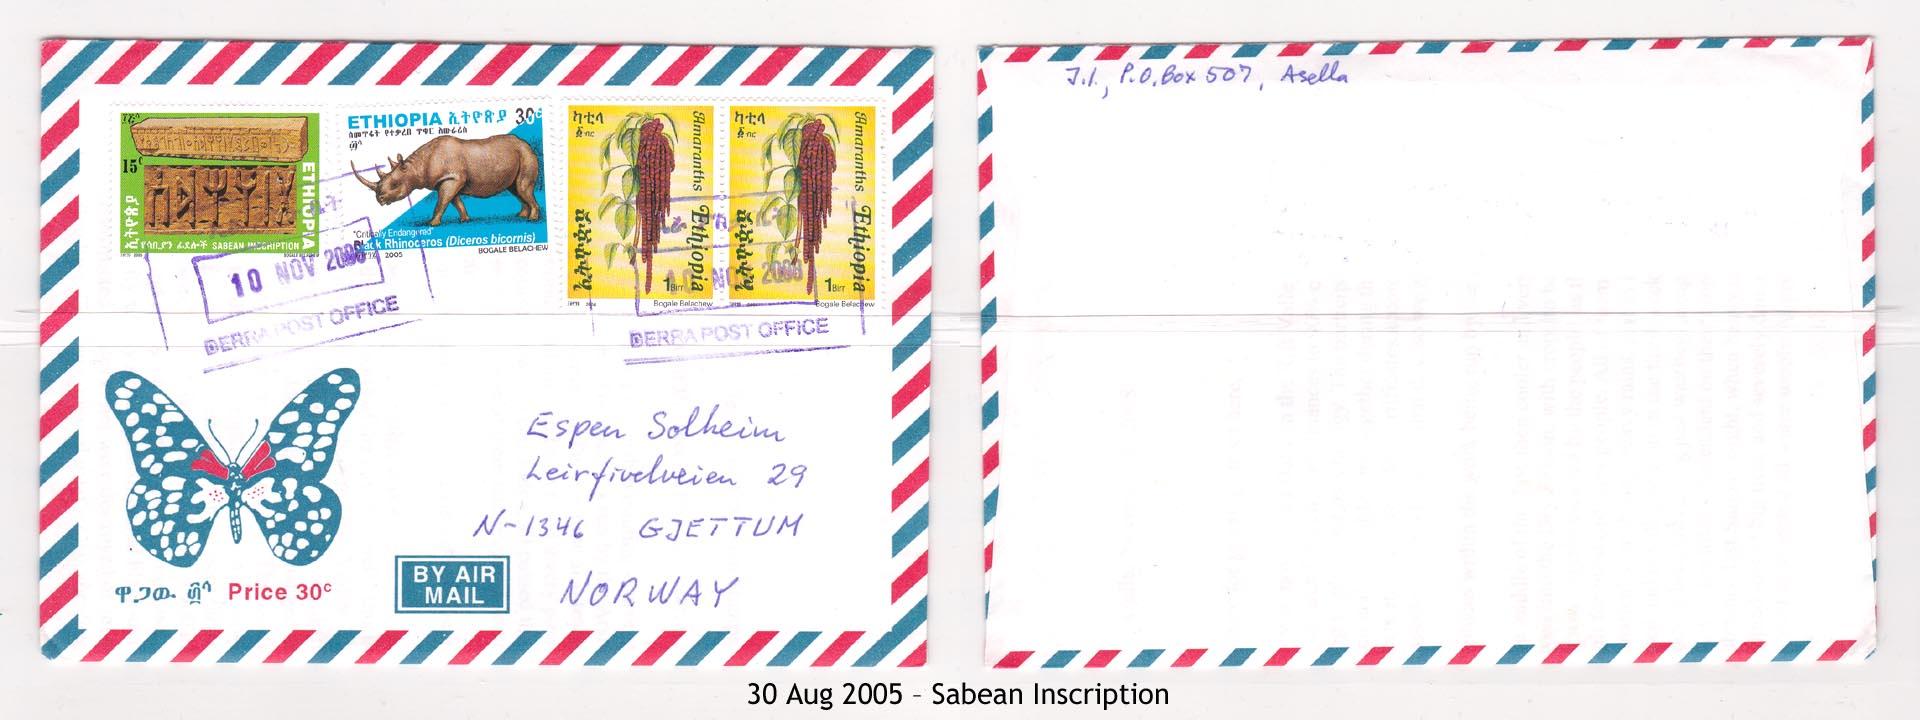 20050830 – Sabean Inscription